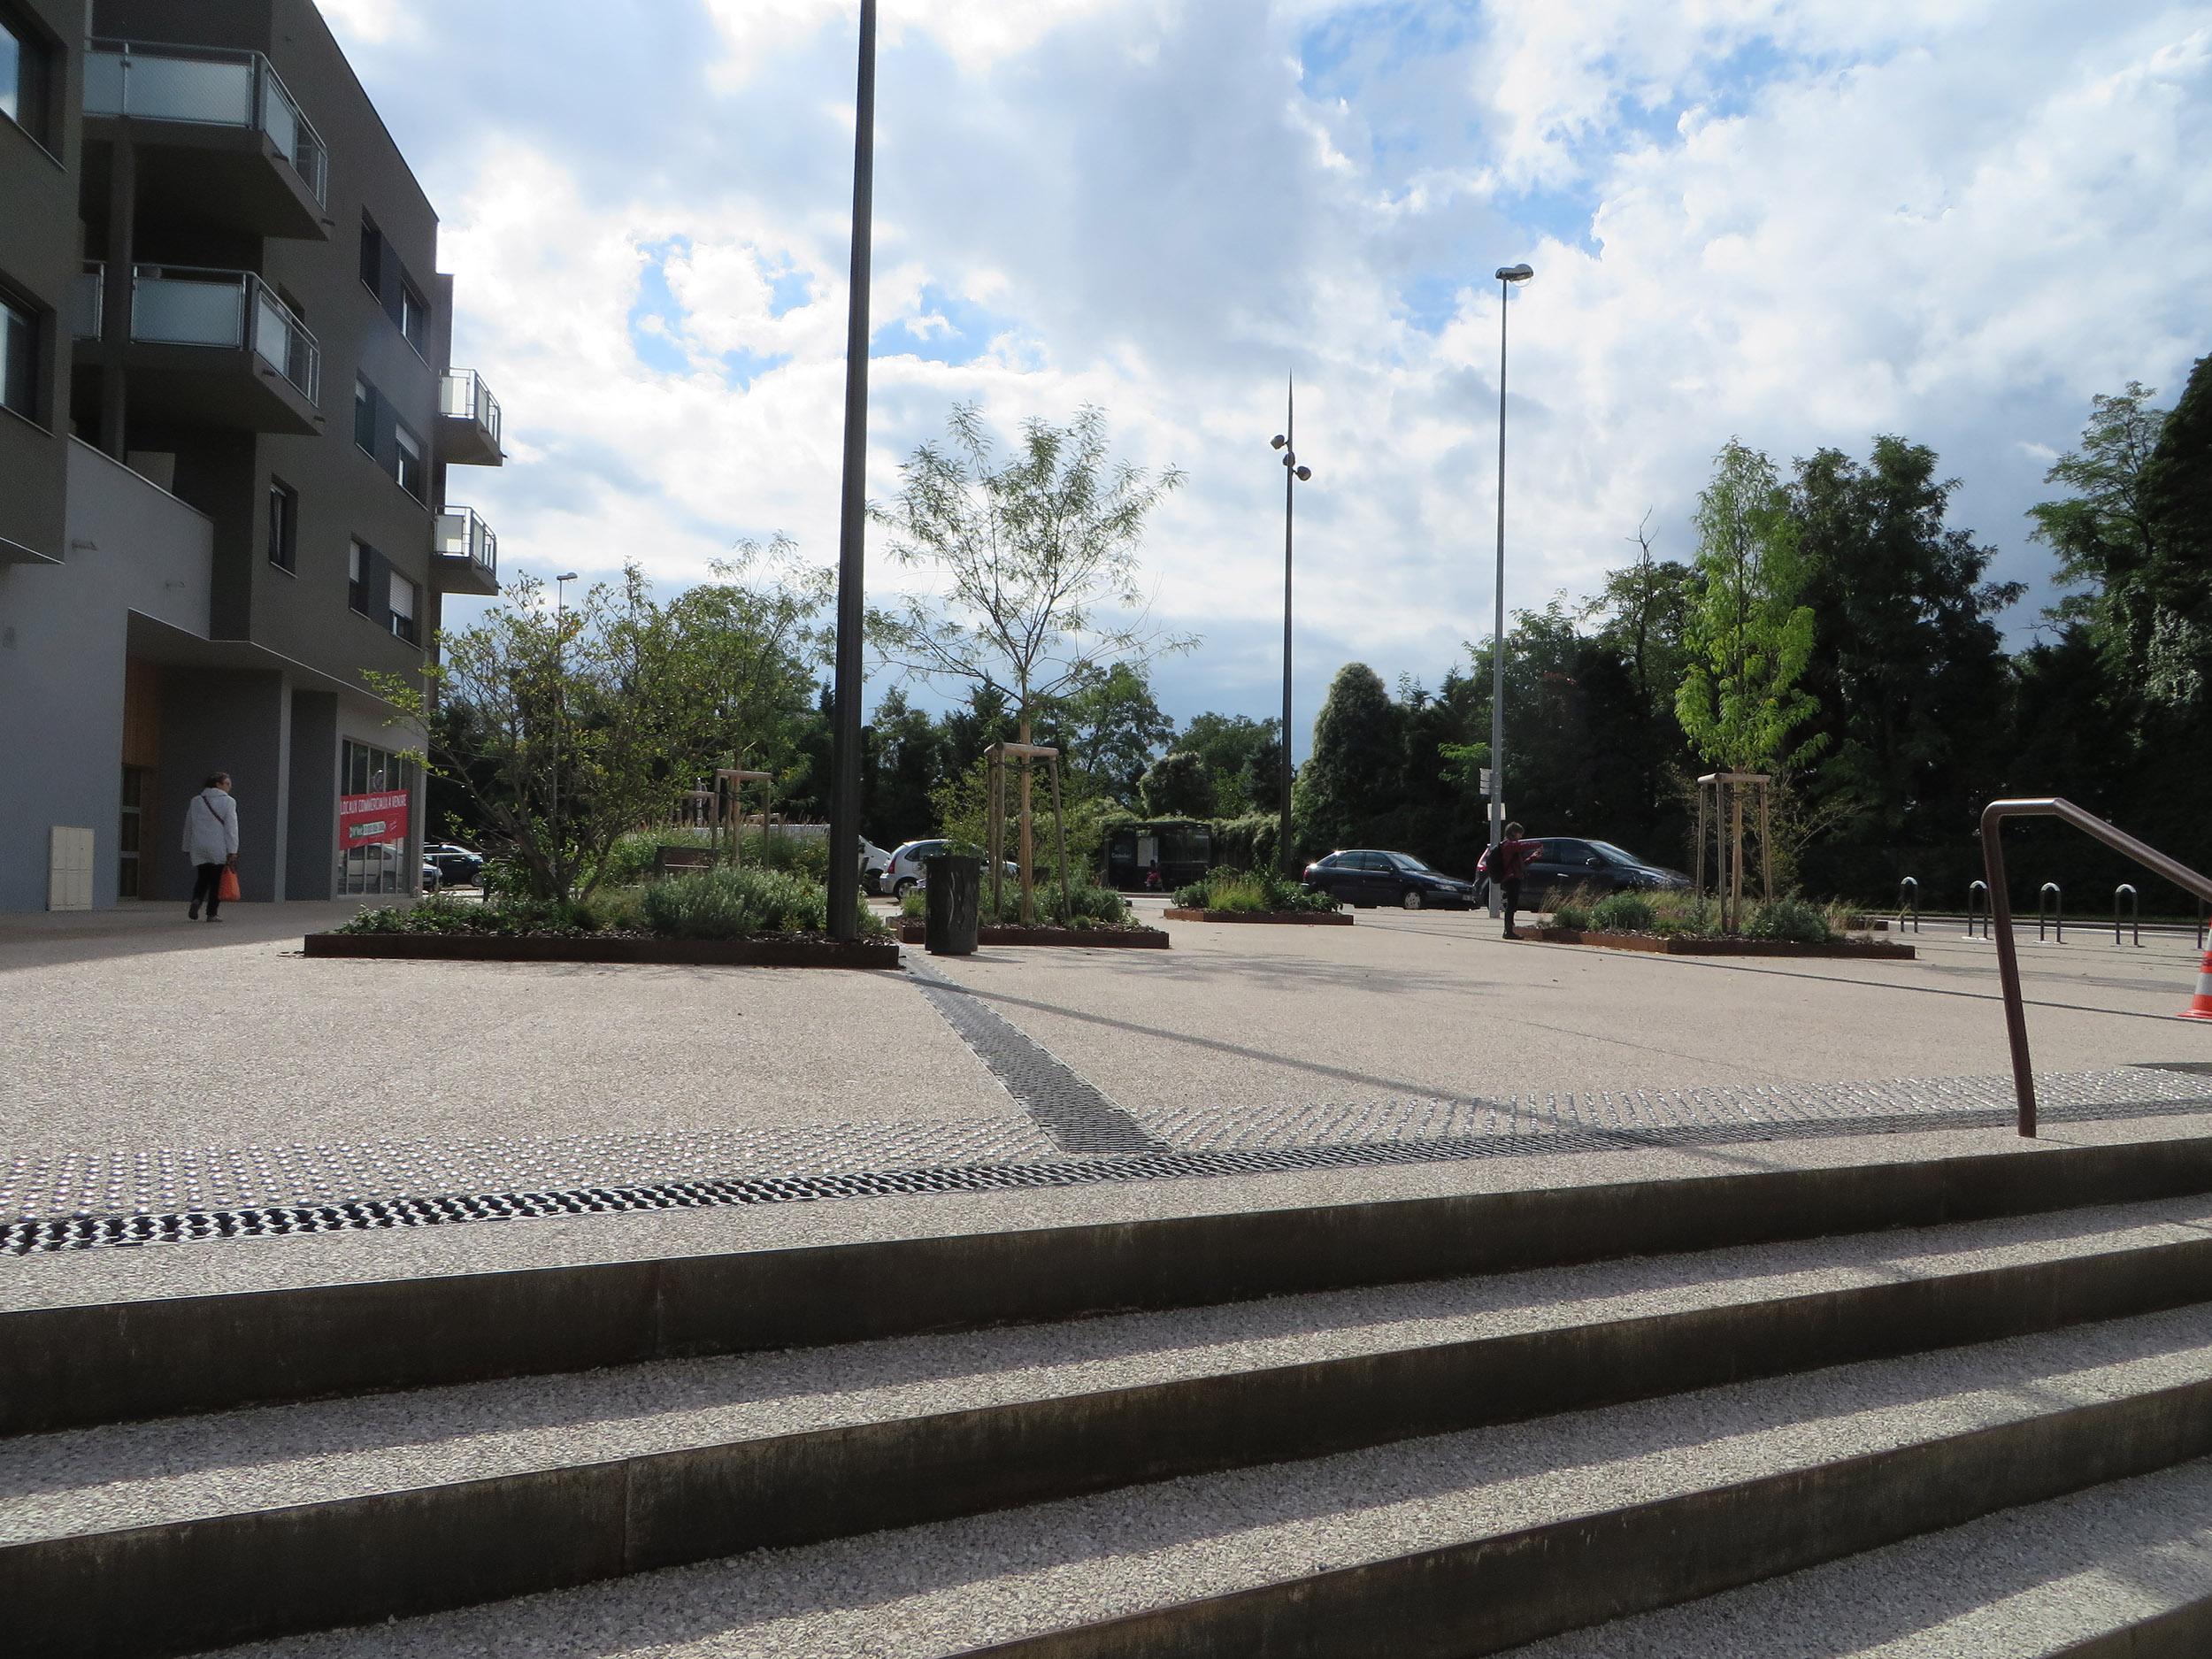 http://iups.eu/wp-content/uploads/2017/01/placette-F-Mitterrand-Strasbourg-livraison-automne-2015-3.jpg